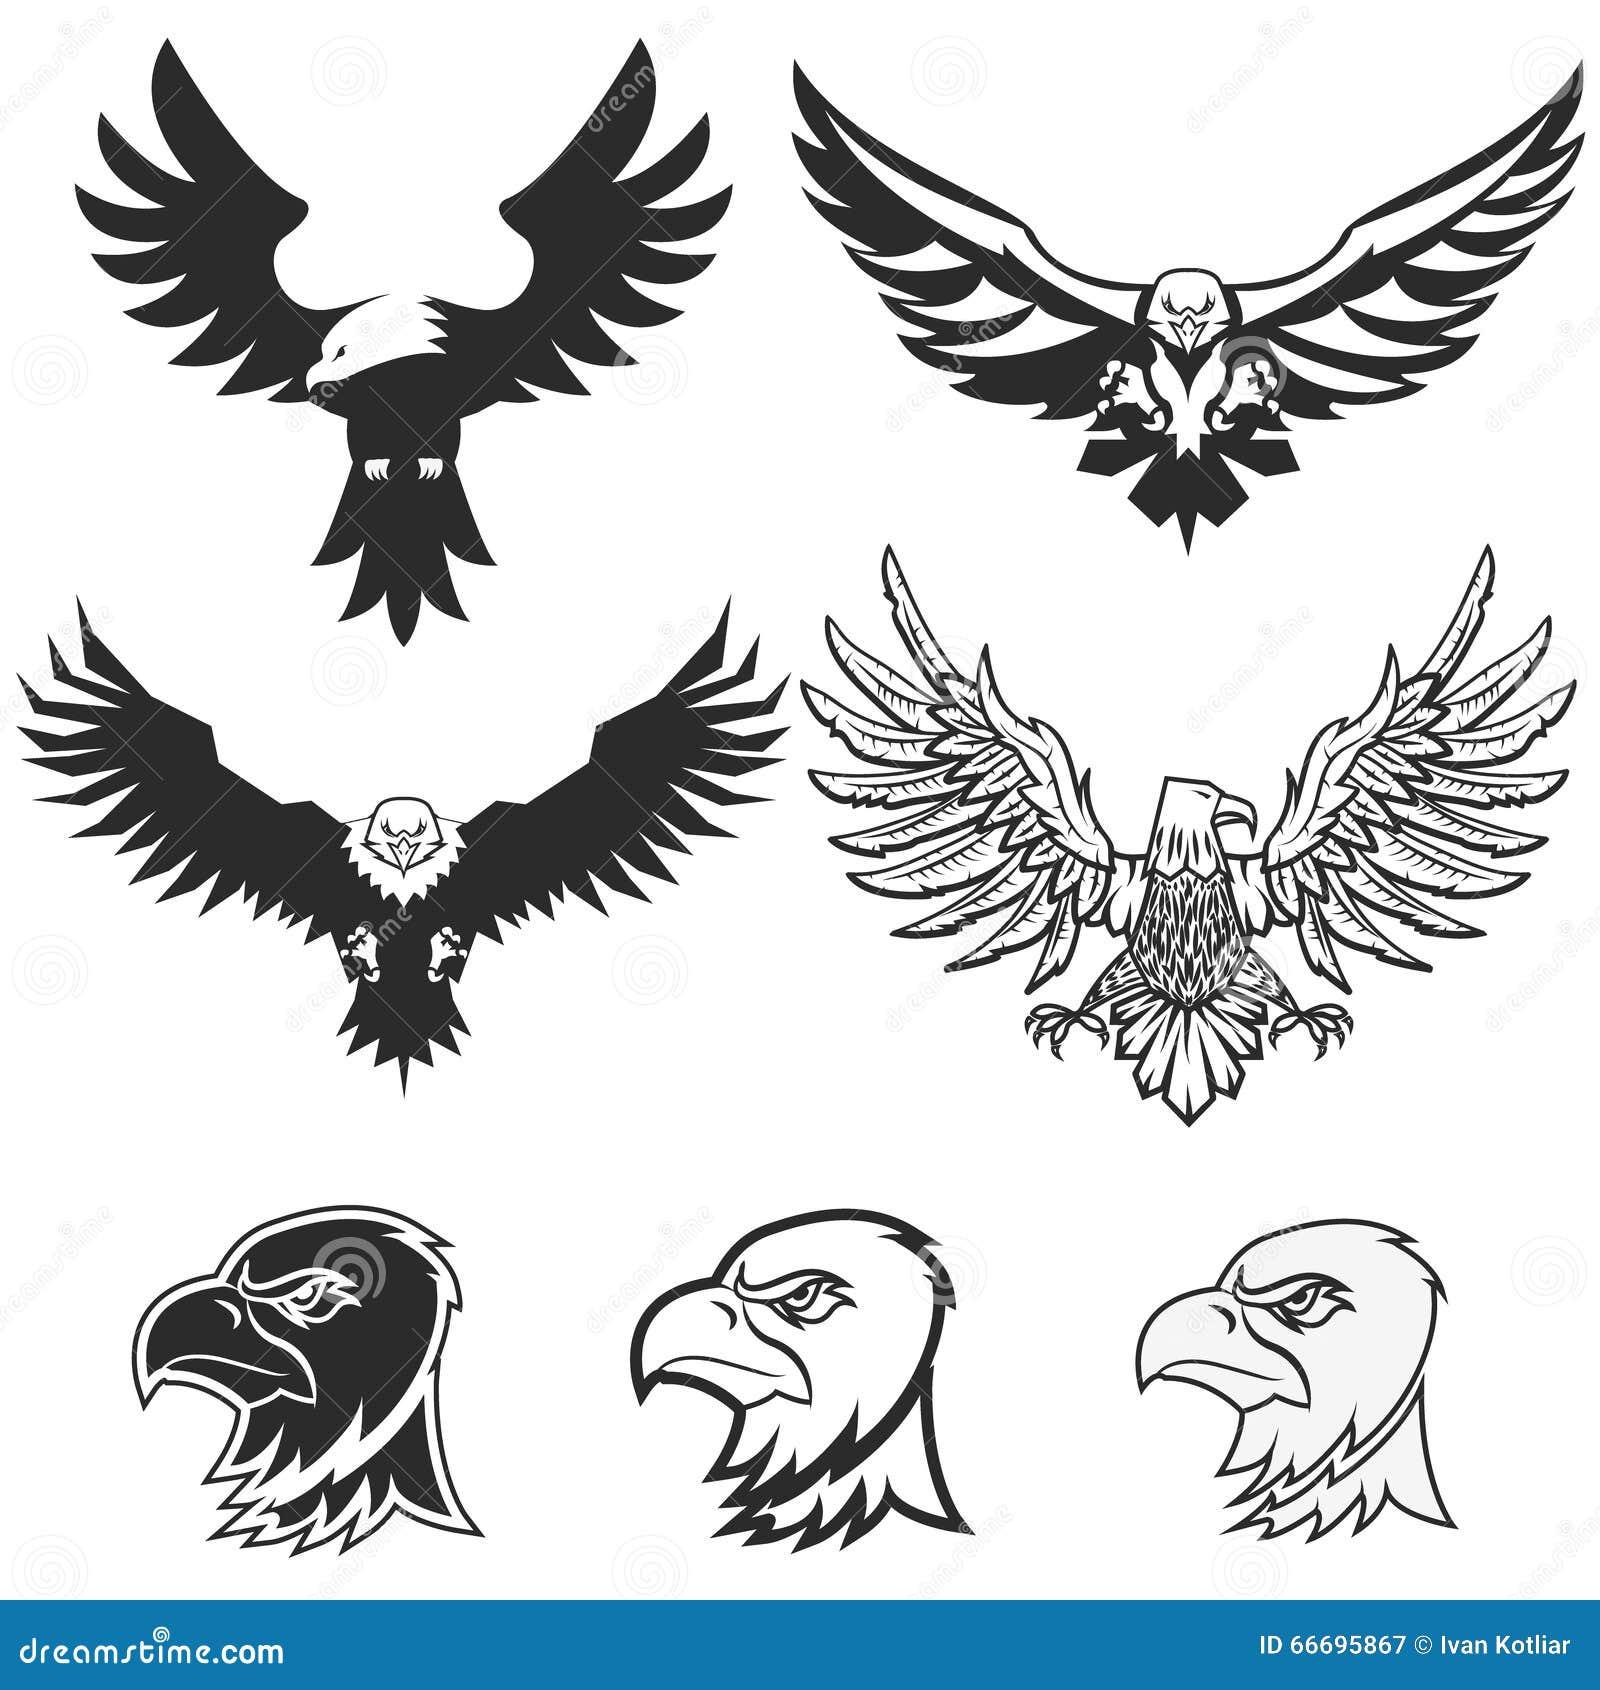 wing abstract emblem set logo template badge label icon tattoo design cartoon vector. Black Bedroom Furniture Sets. Home Design Ideas